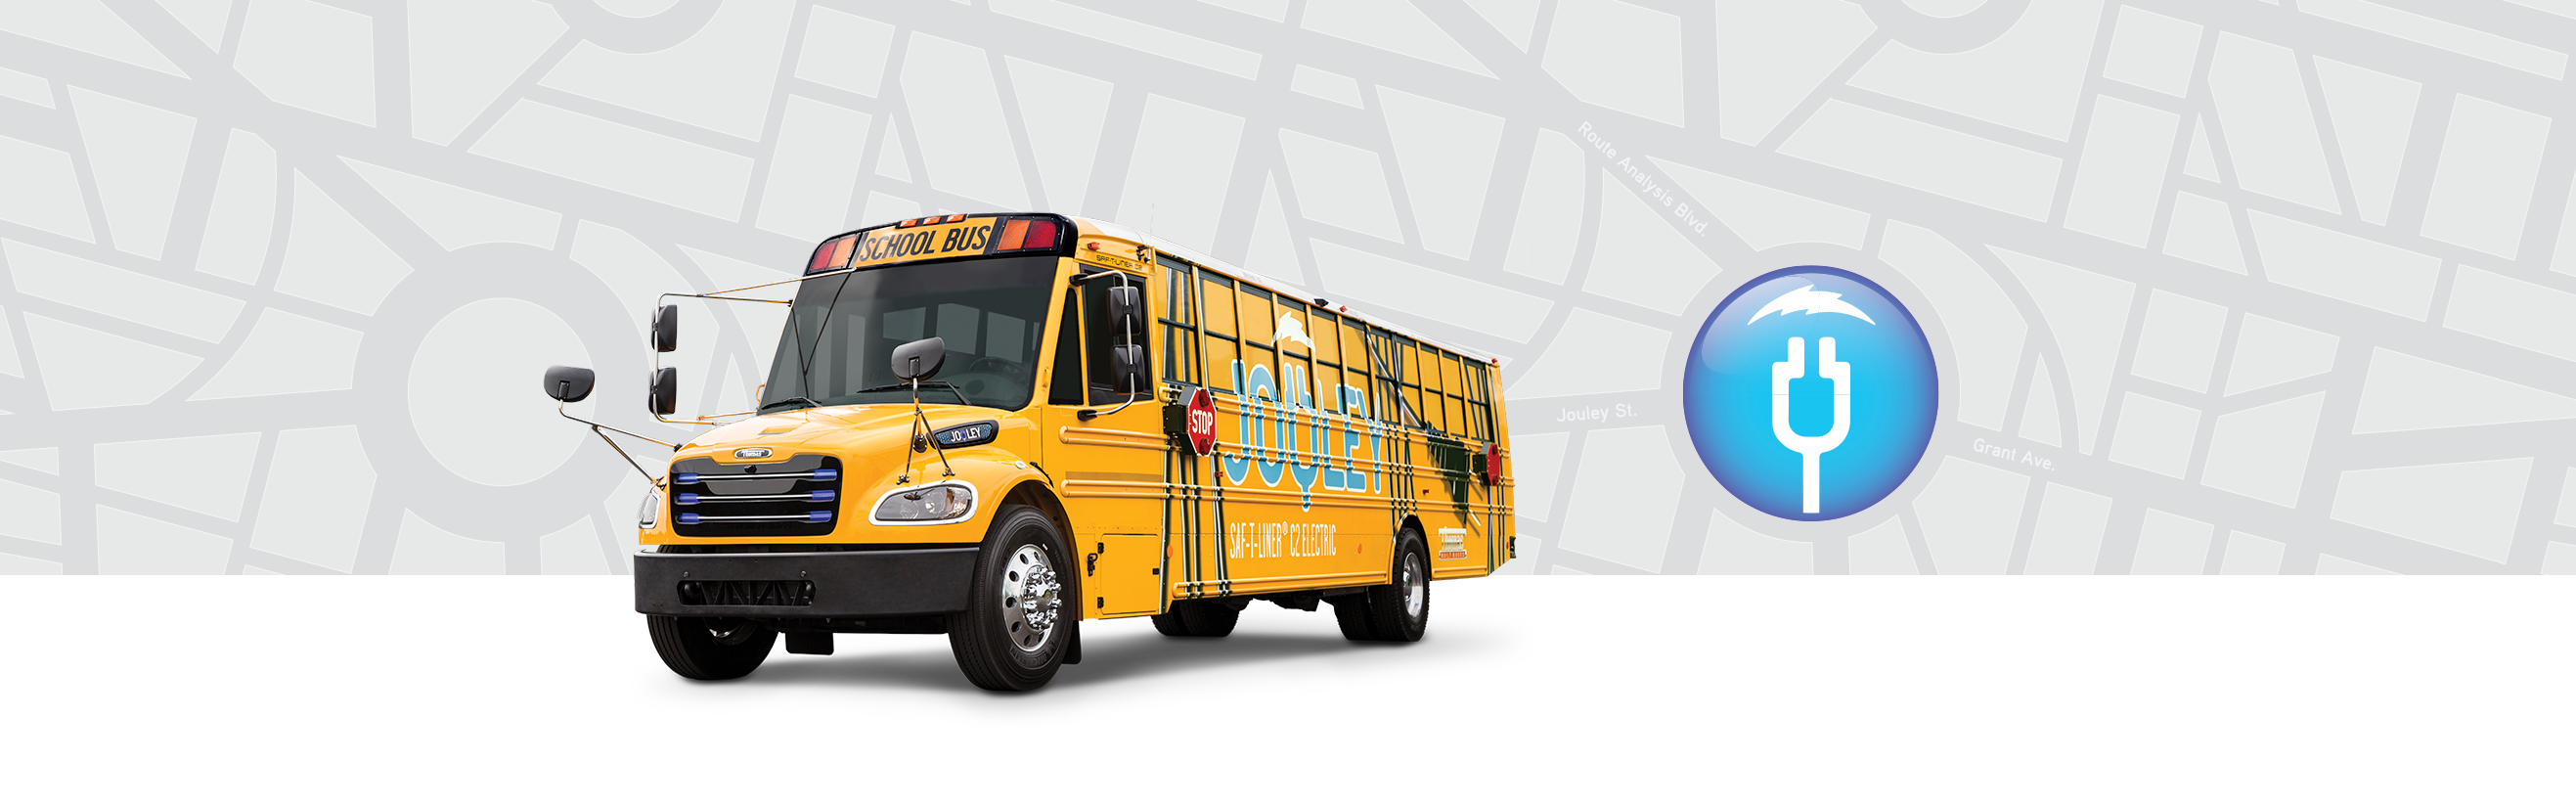 thomas bus wiring diagrams for the alt thomas built buses  thomas built buses